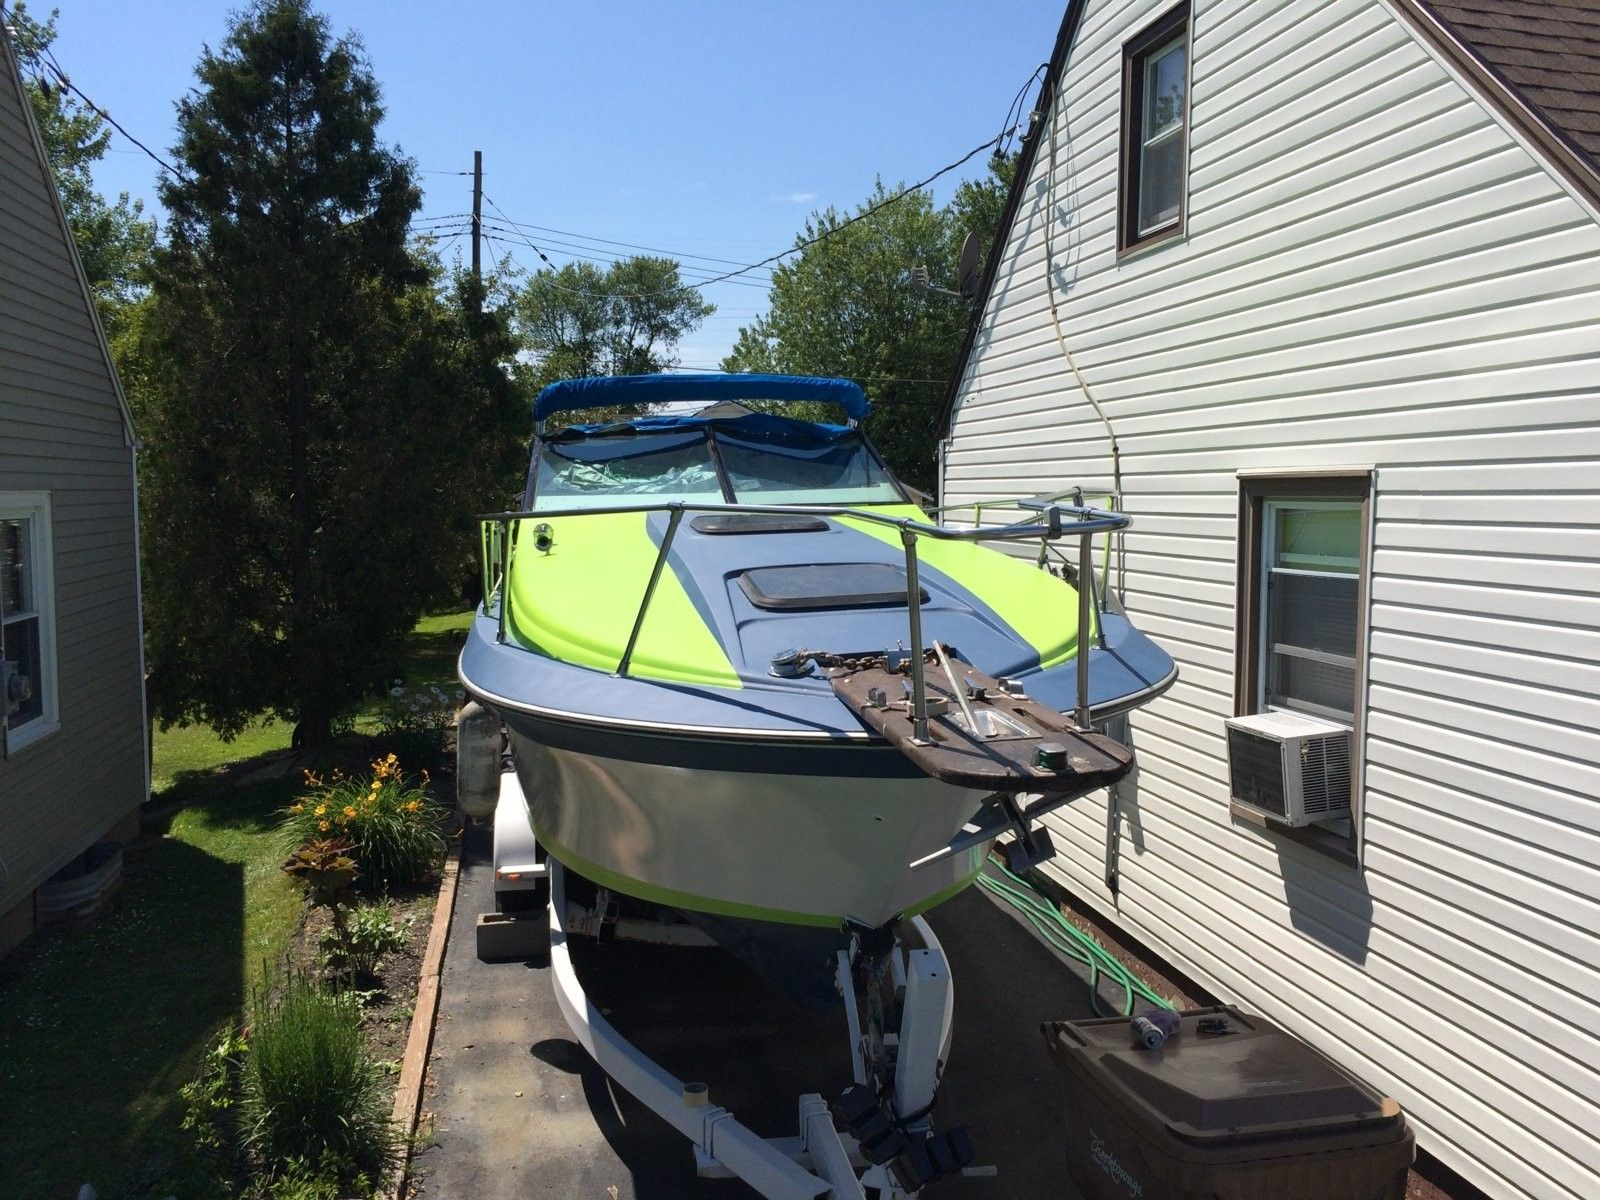 Name my boat - FREE Vinyl decal if chosen!! - IMG_4923.JPG